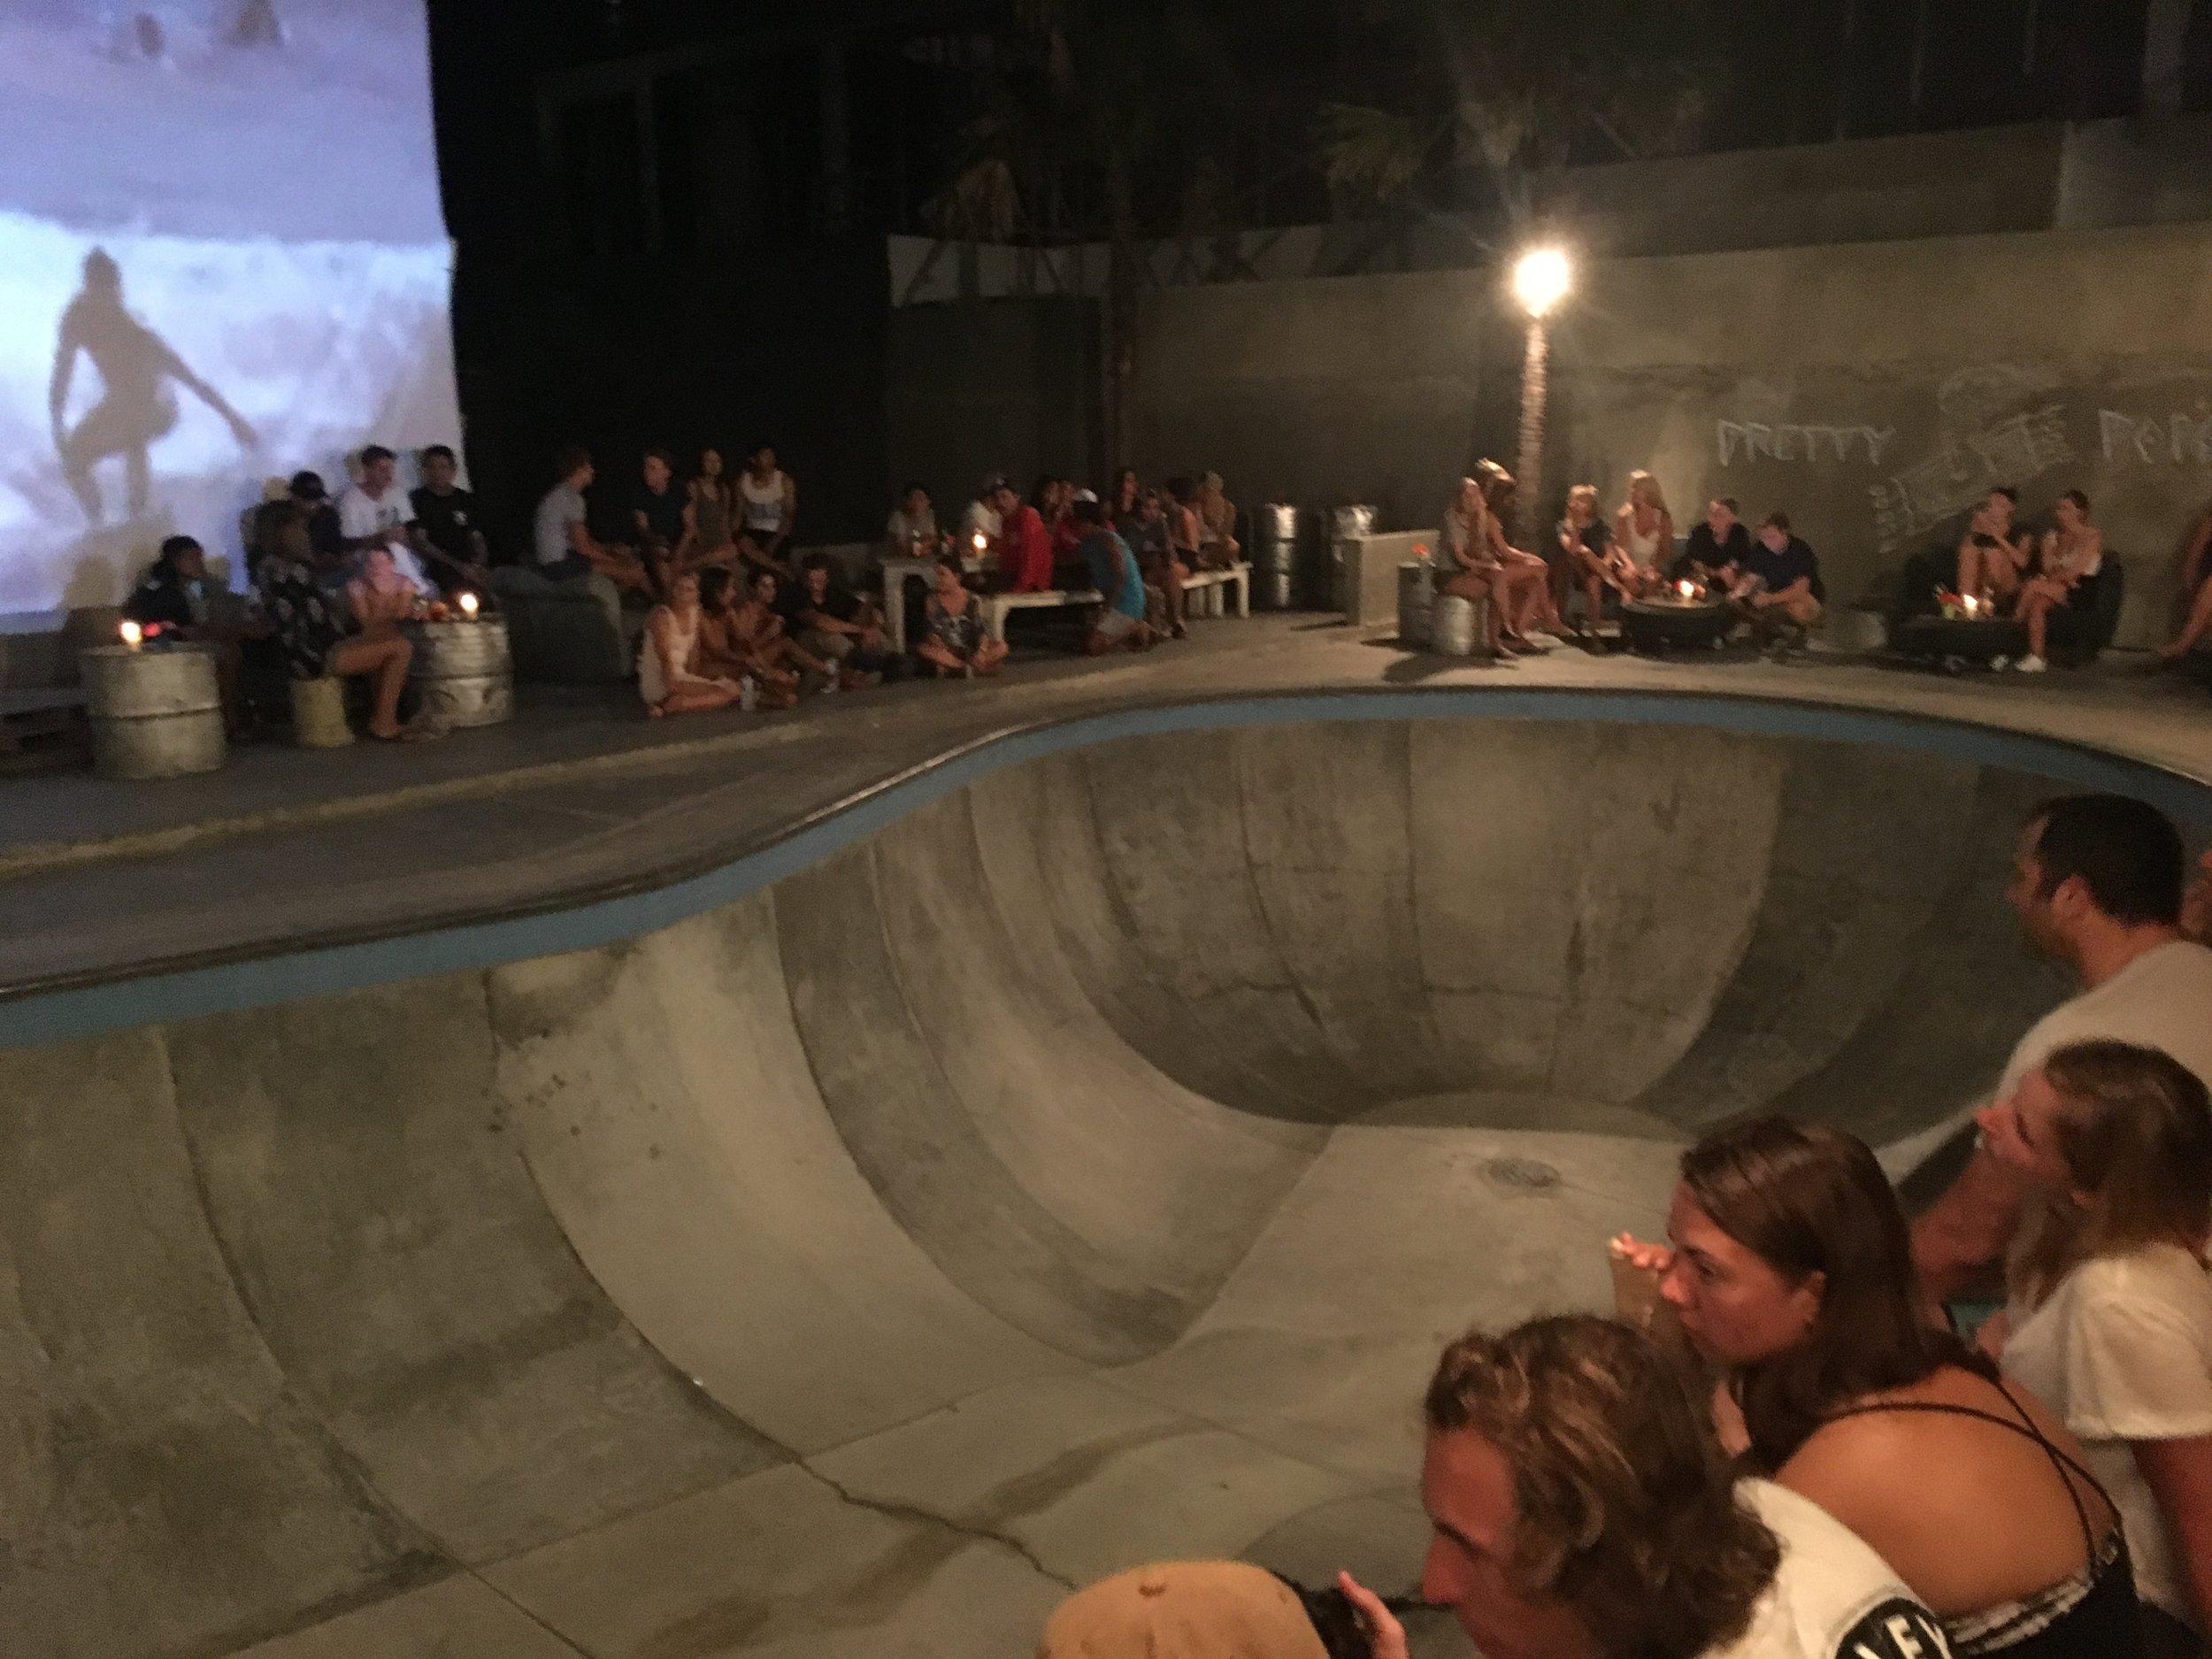 Skateboard park turned bar